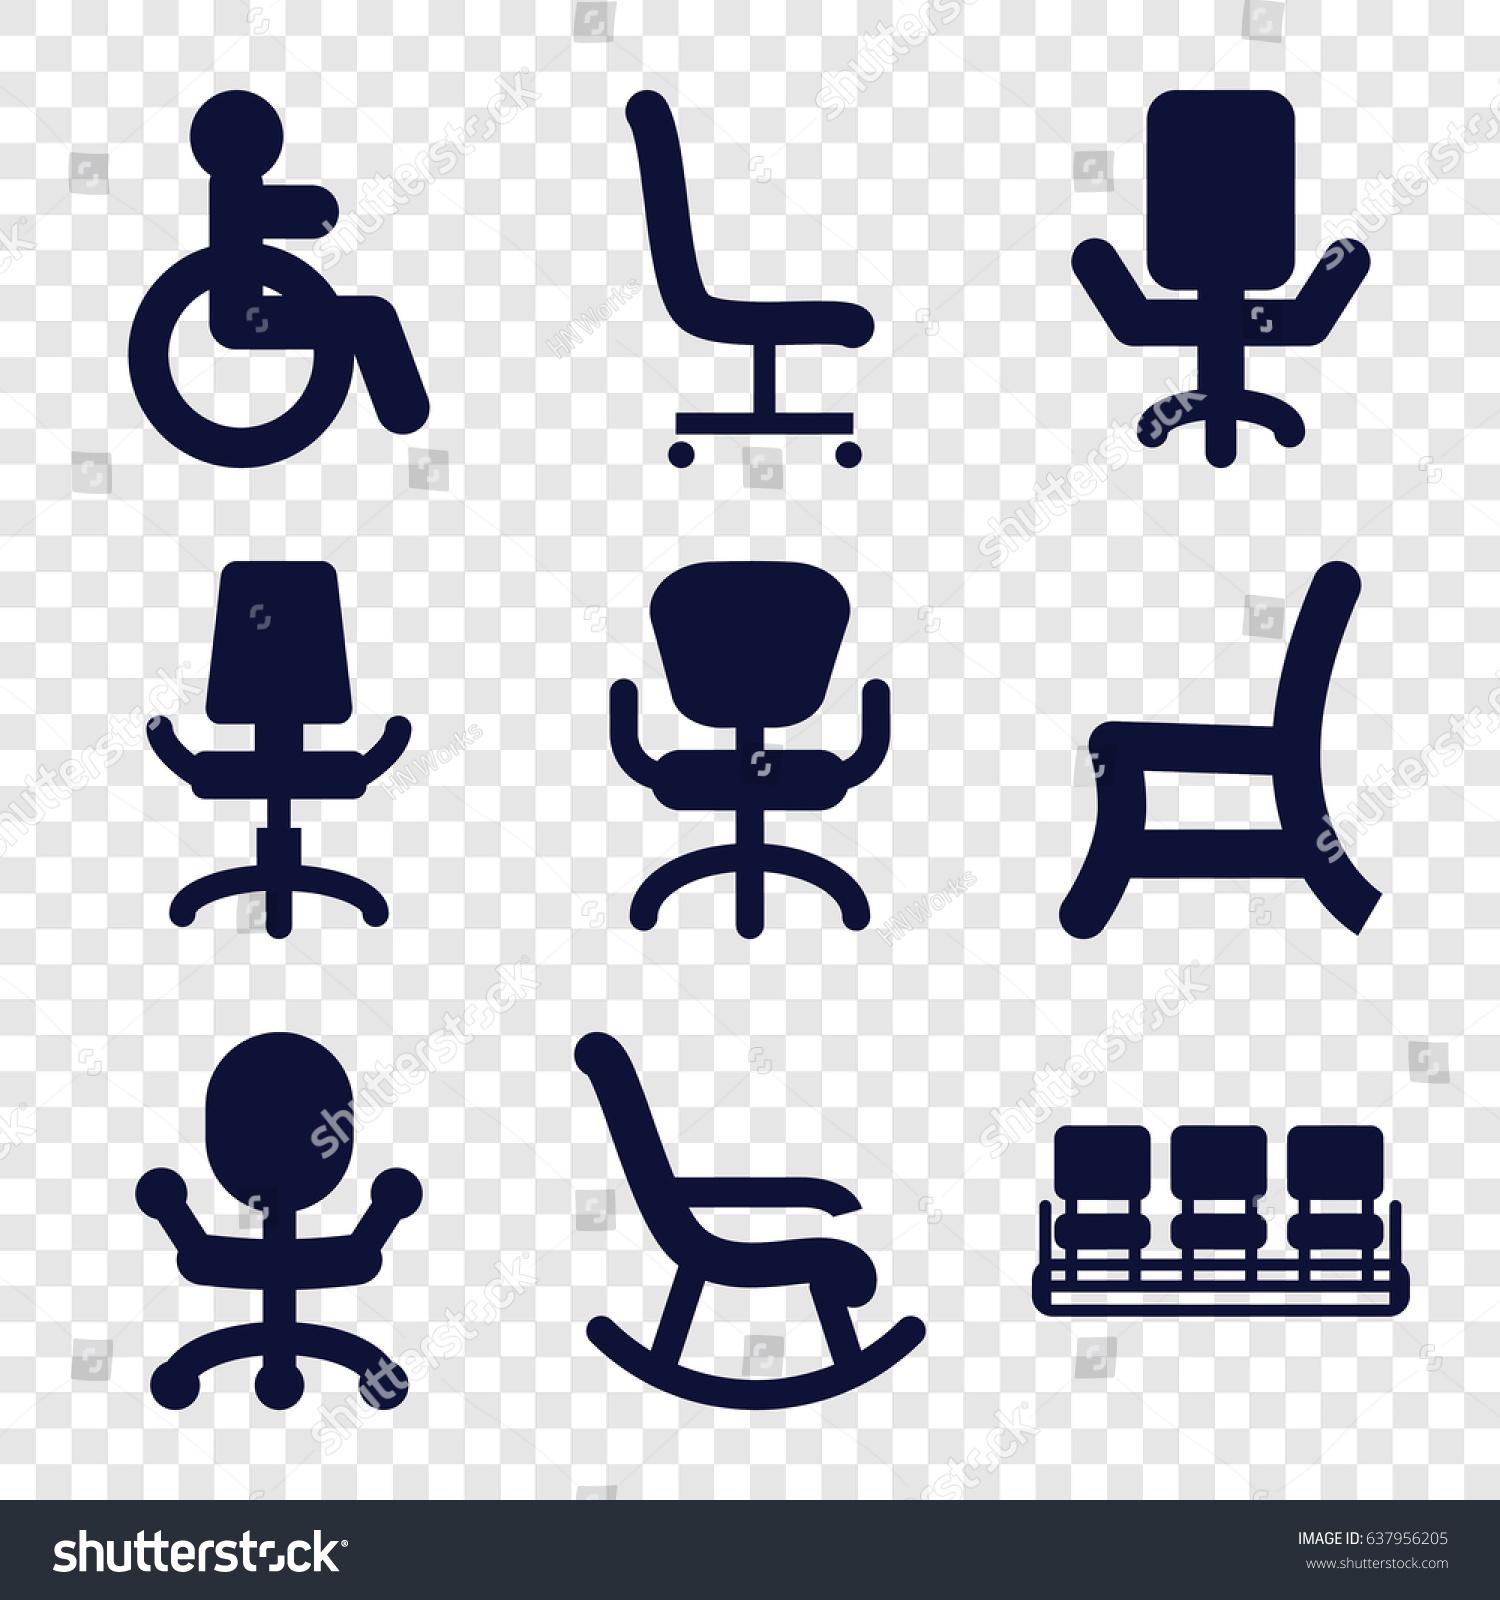 Armchair Icons Set Set 9 Armchair Stock Vector 637956205 - Shutterstock